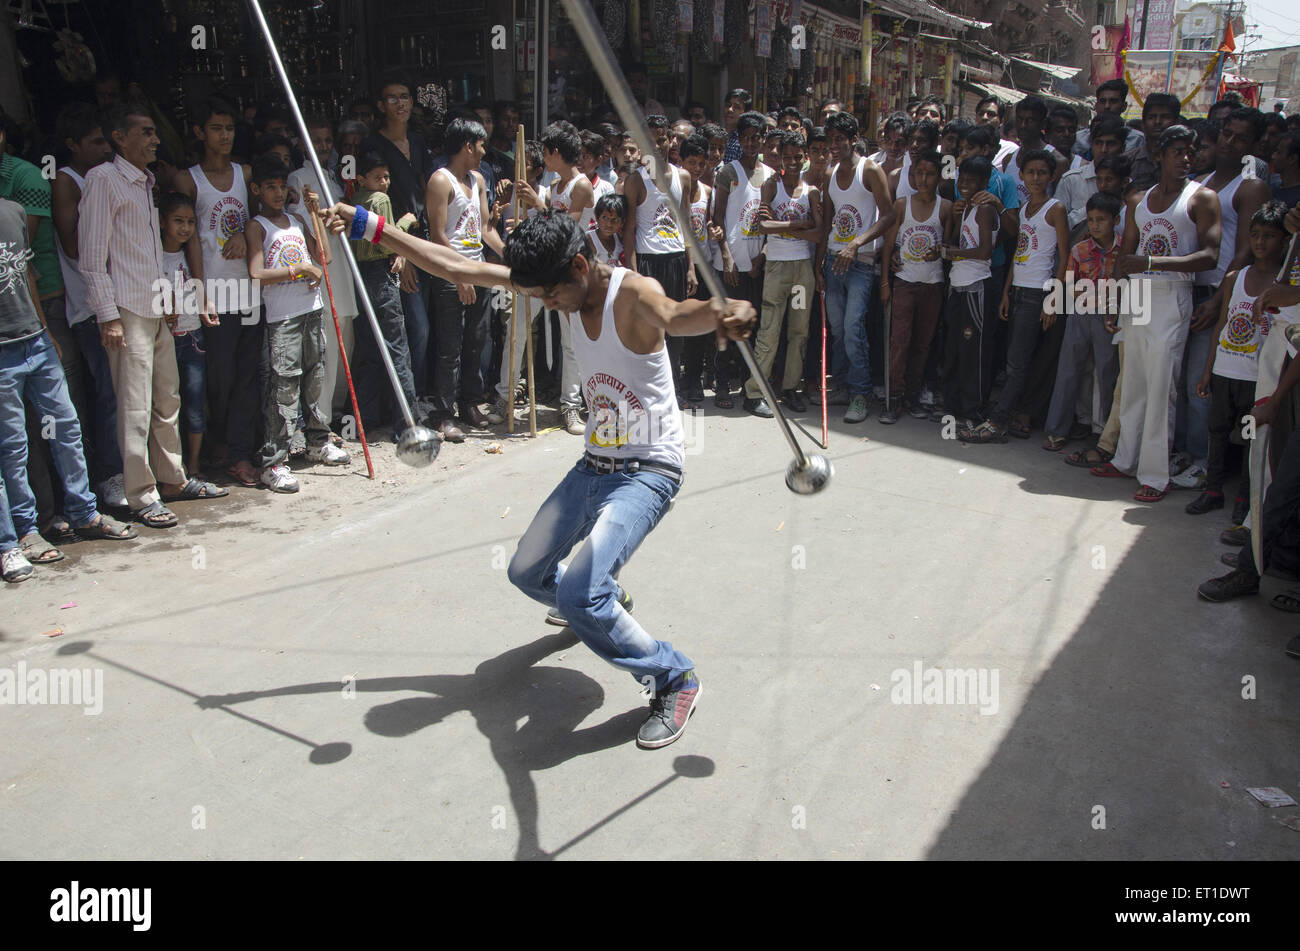 boy performing acrobatics in Ram navmi procession in Jodhpur at Rajasthan India - Stock Image